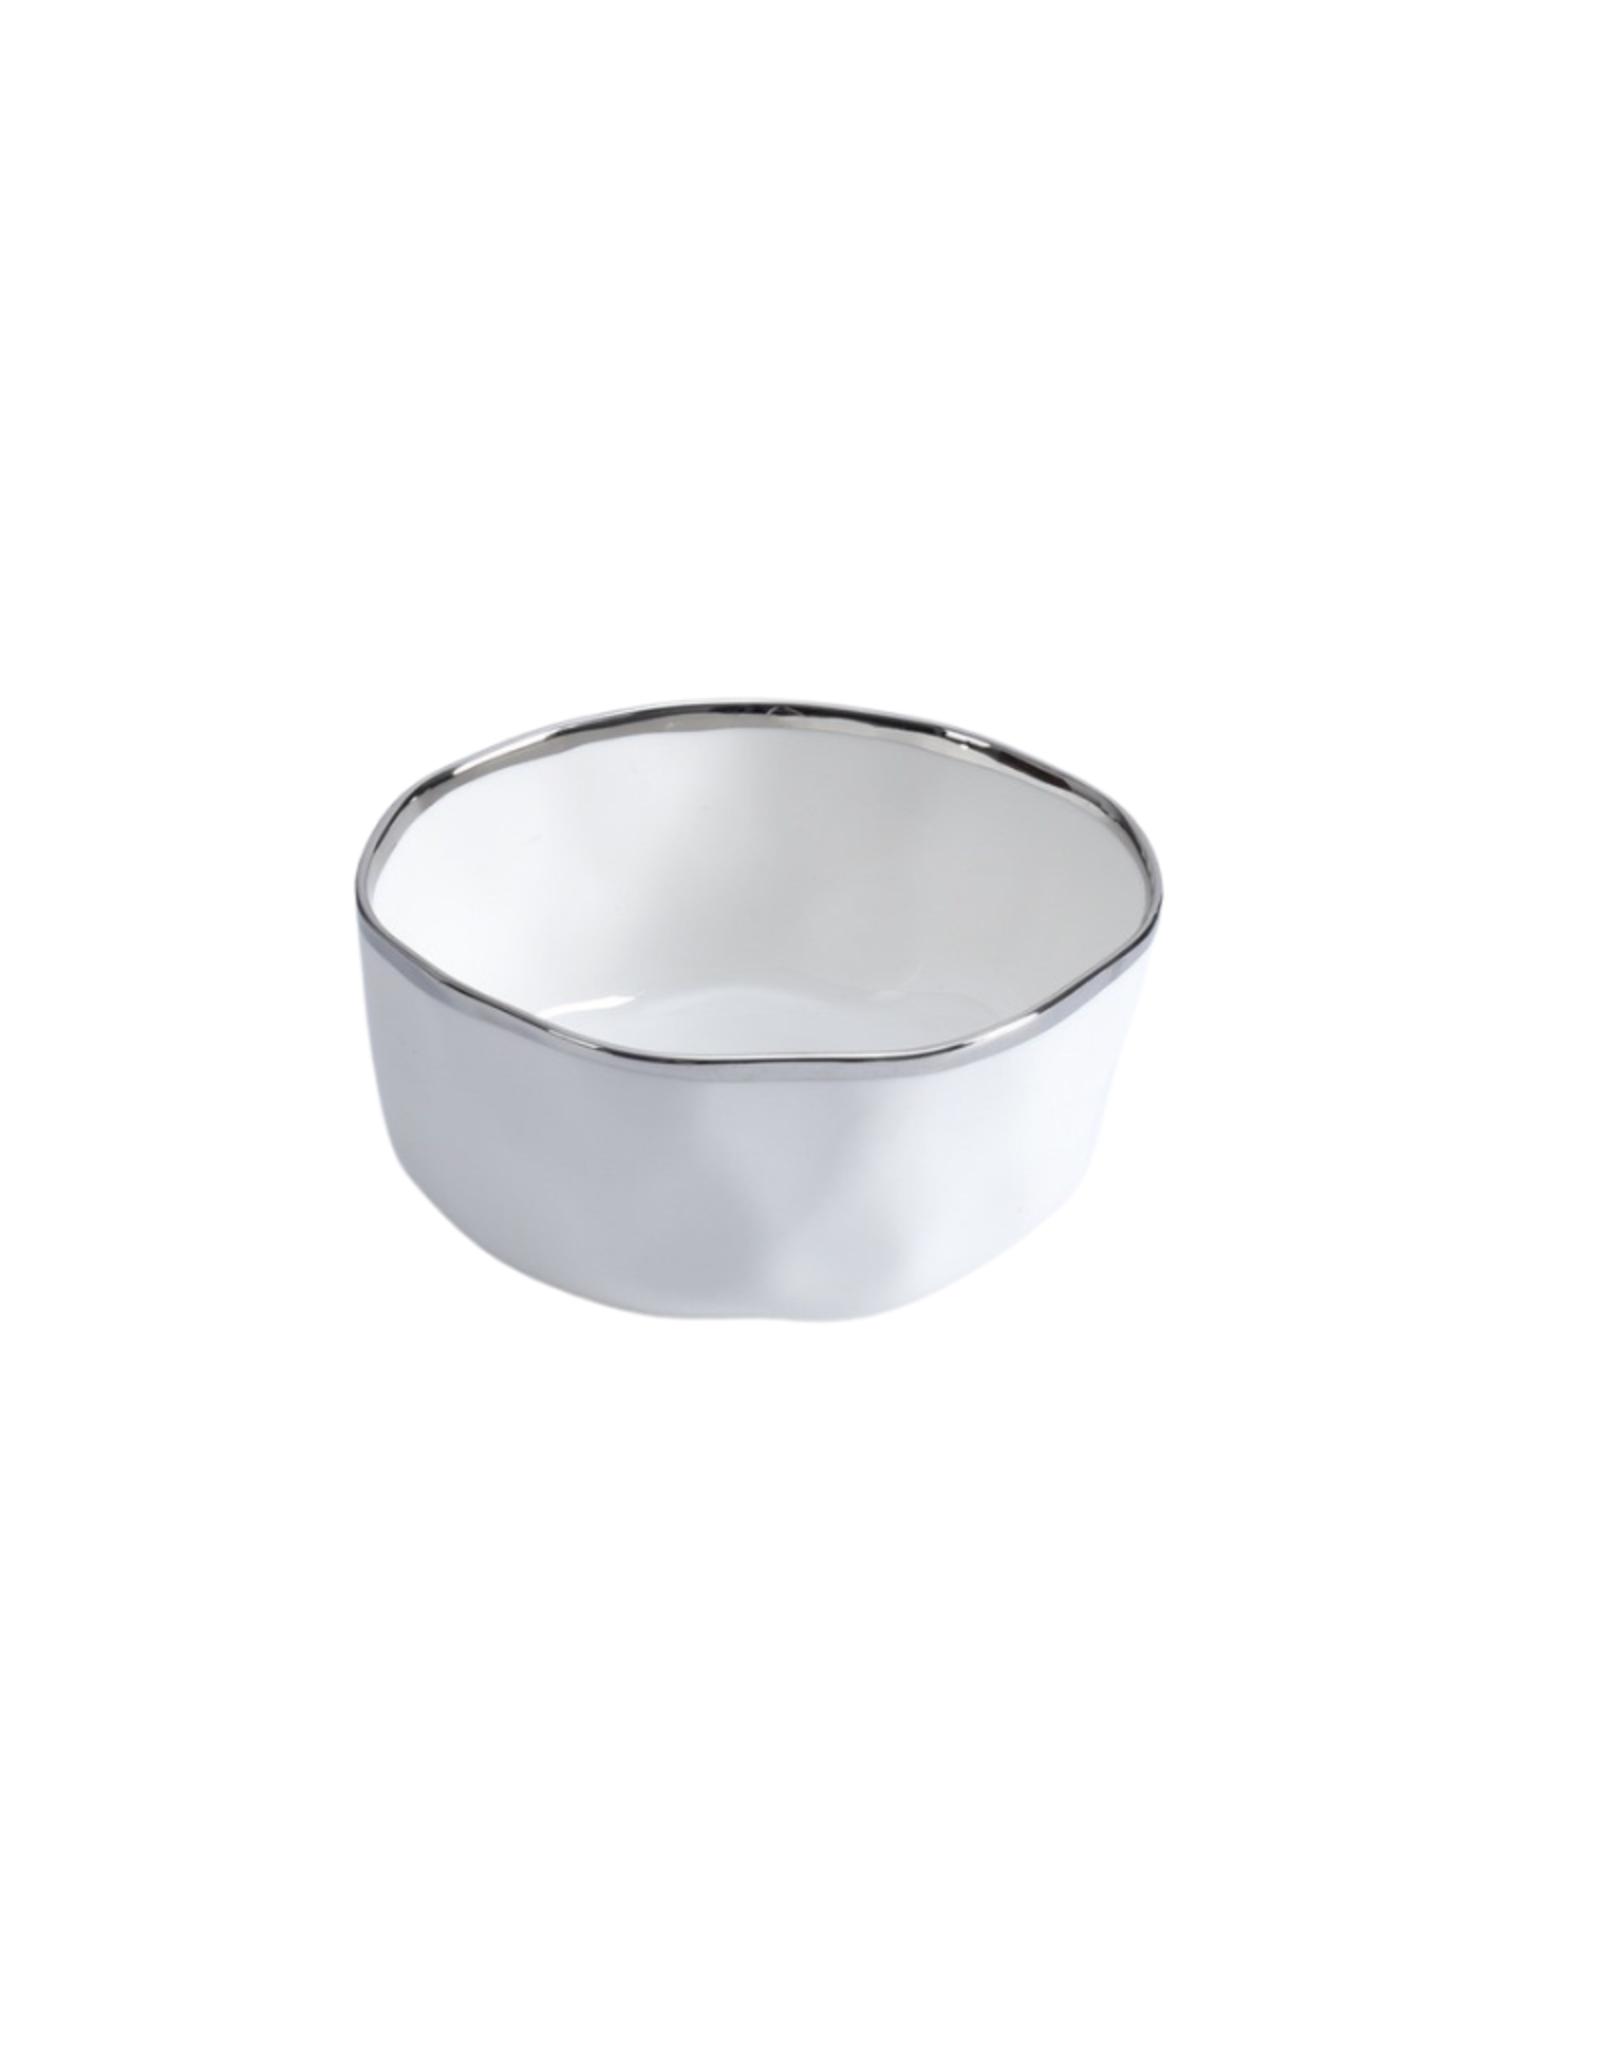 Small White Porcelain Bowl